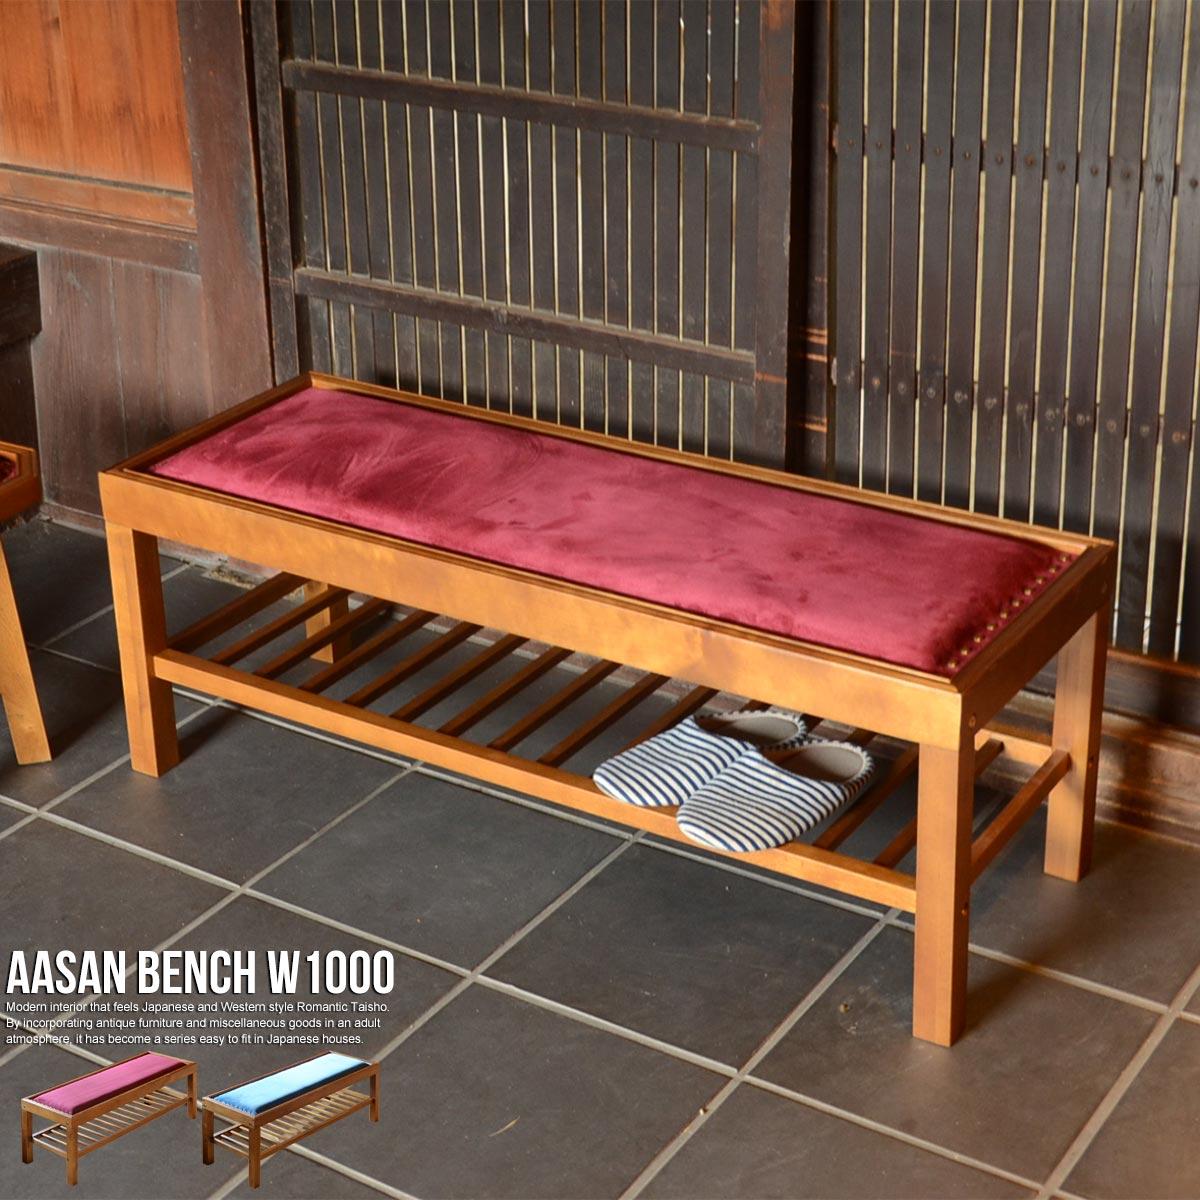 AASAN(アッサン) ベロアベンチ 幅100cm ダイニングベンチ 玄関ベンチ フットベンチ 古民家風カフェ 畳部屋 洋室 和室 テーブル アンティーク風